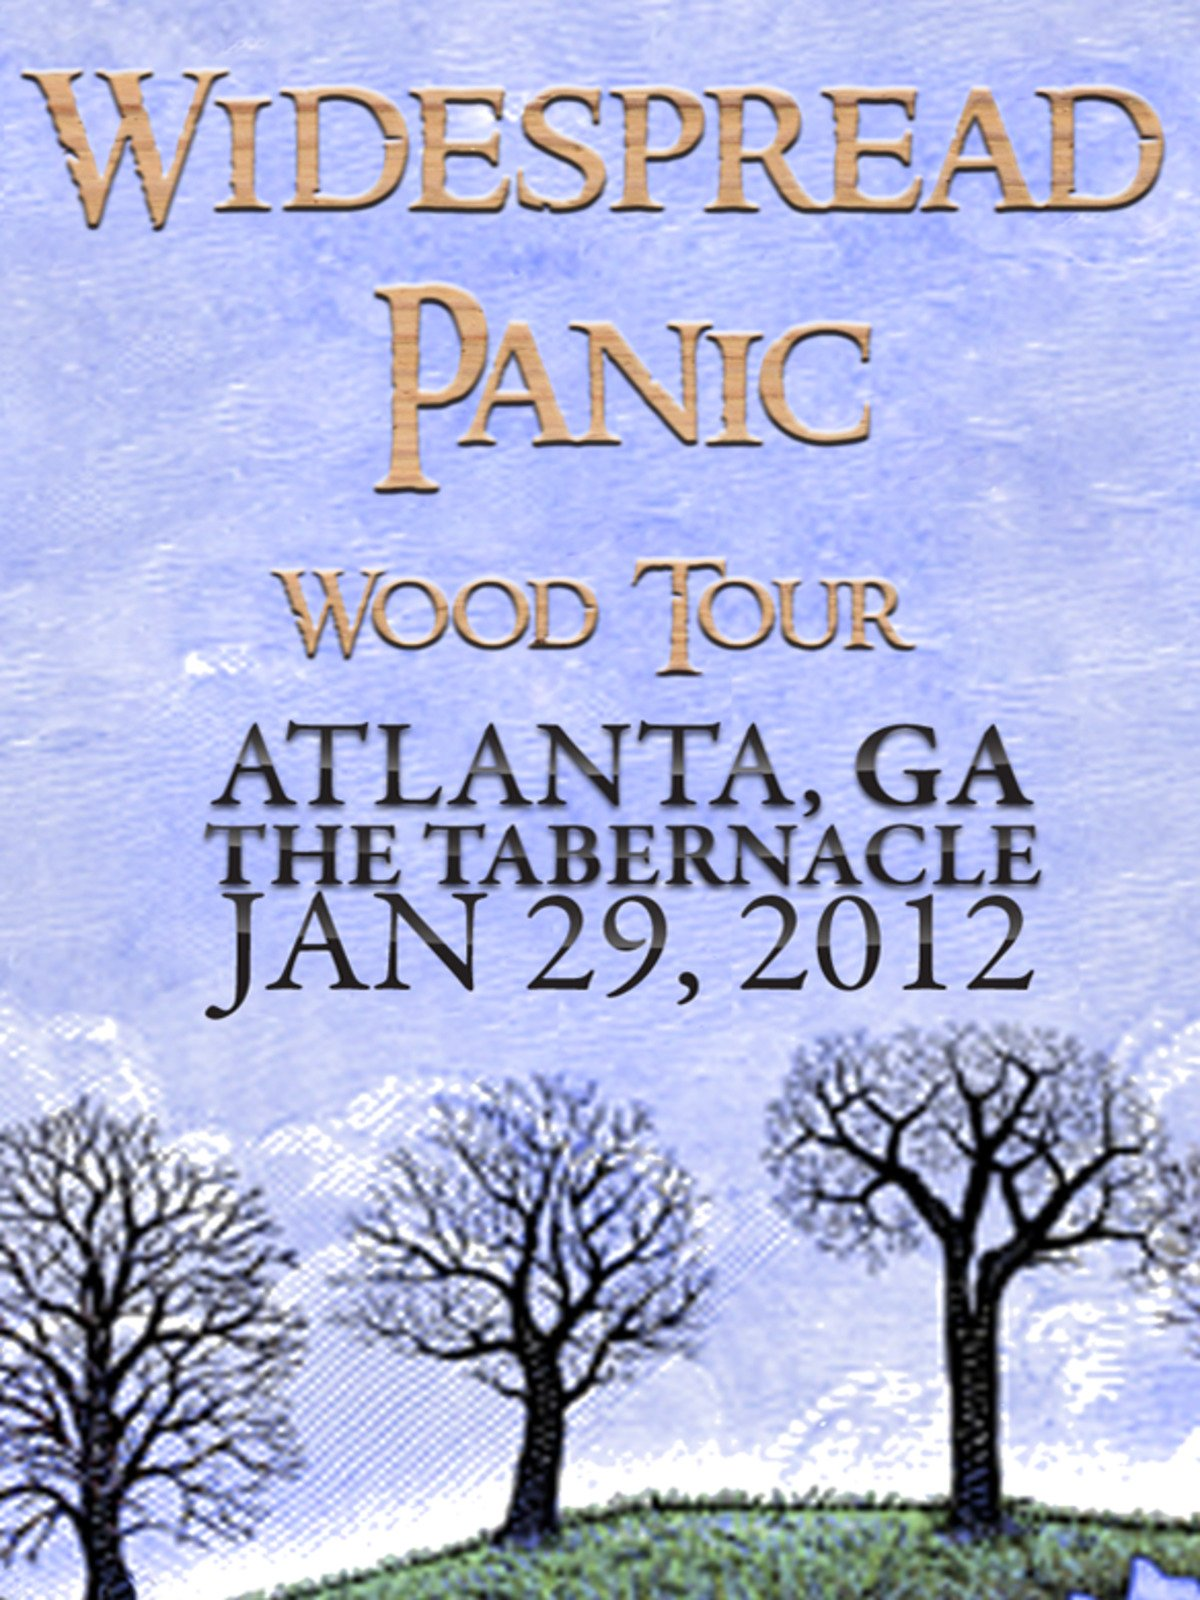 Widespread Panic: Wood Tour - Atlanta, GA The Tabernacle January 29, 2012 on Amazon Prime Instant Video UK